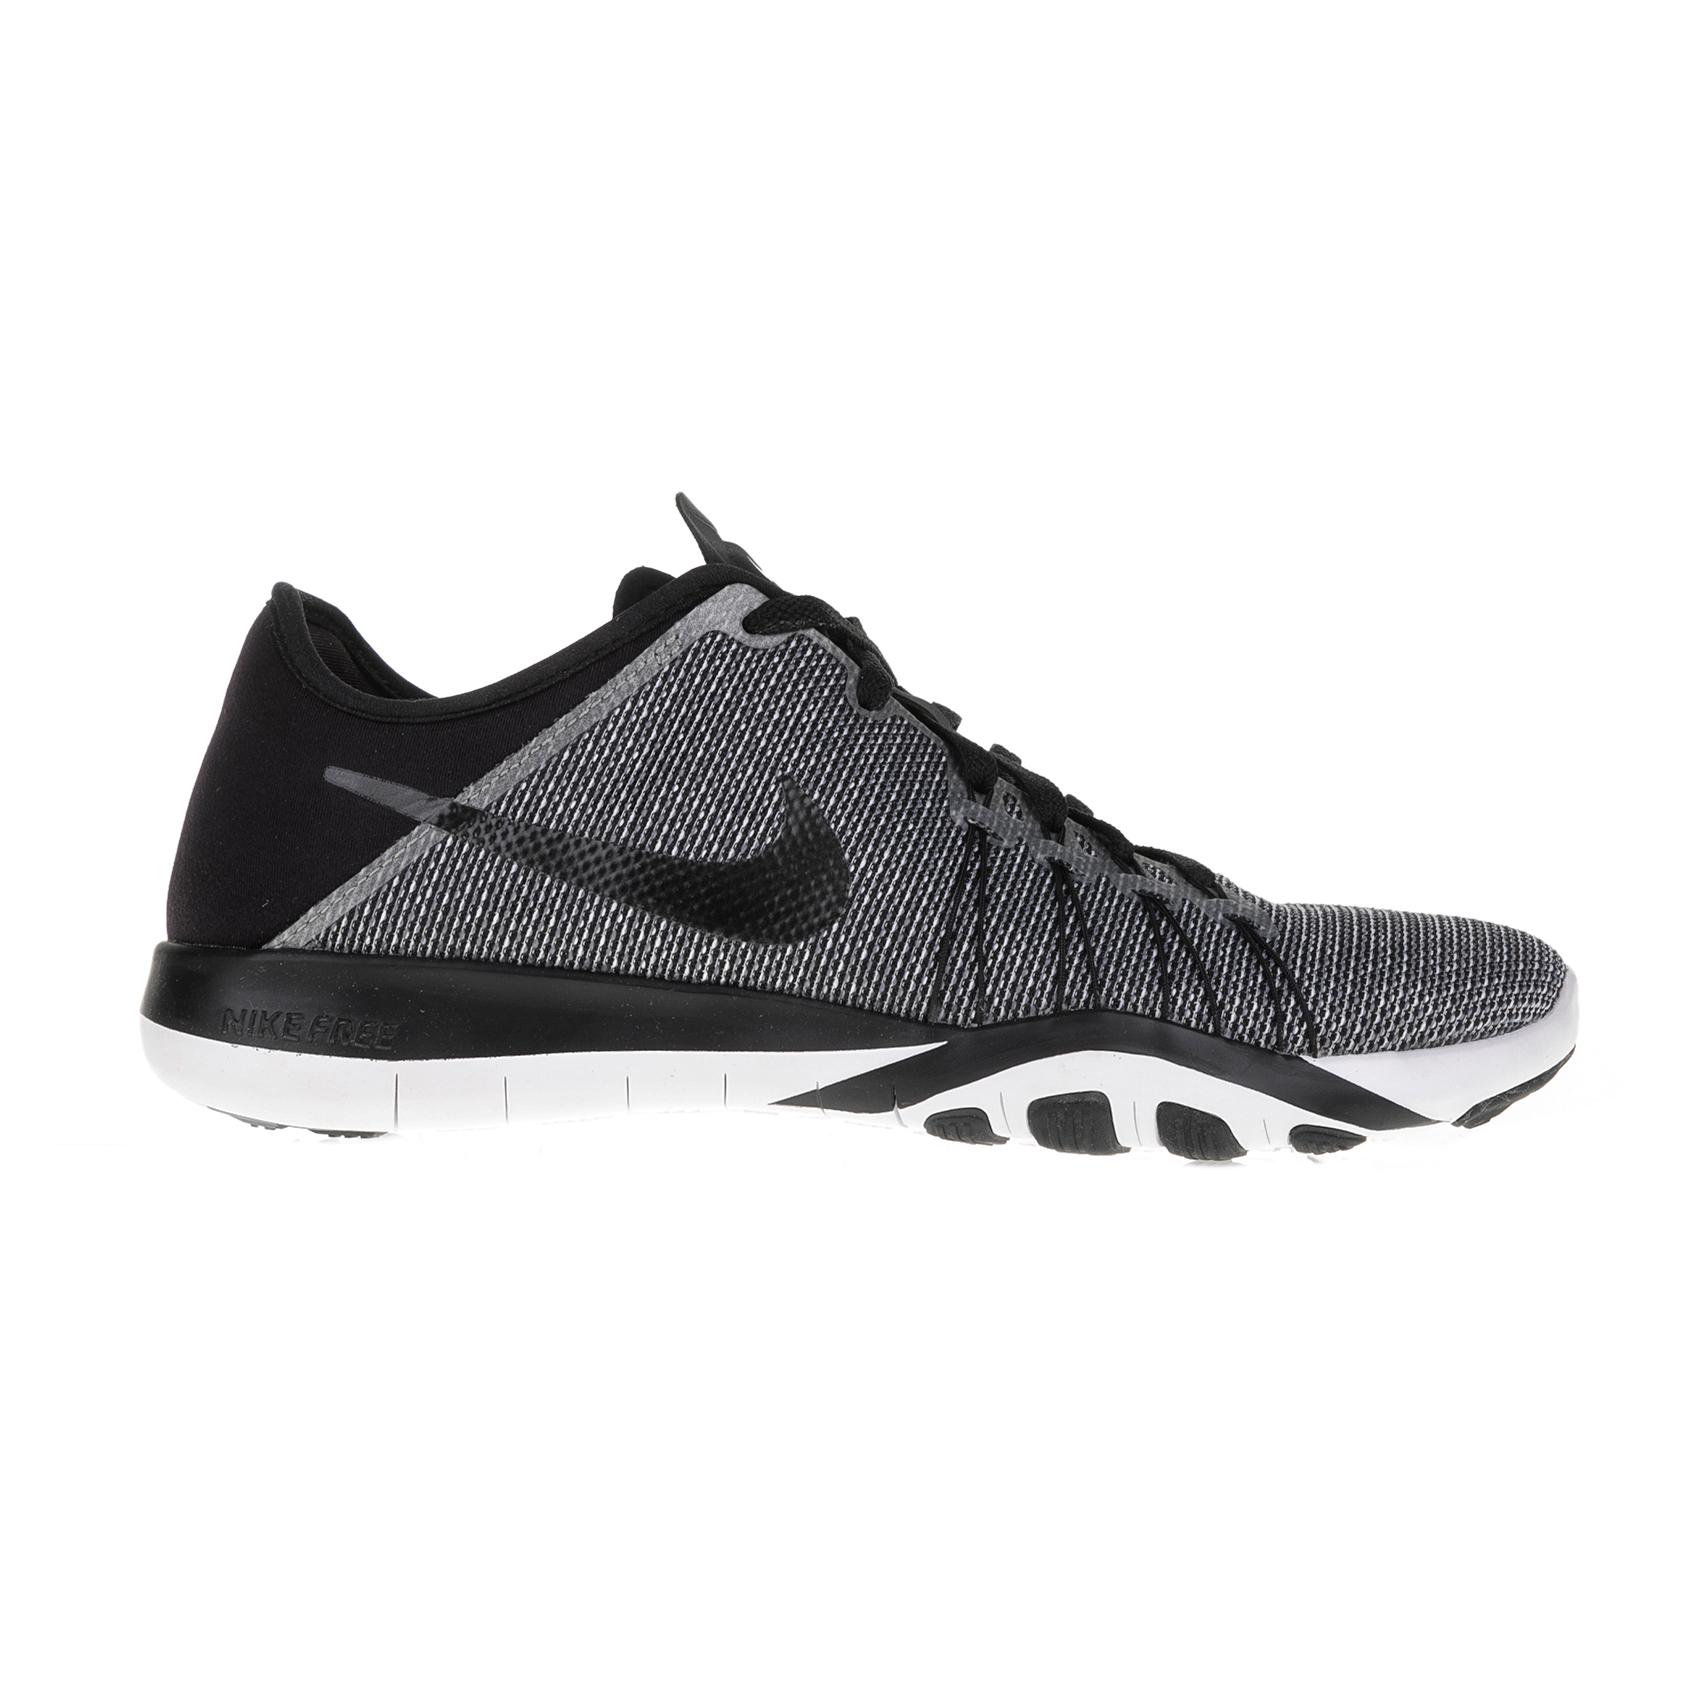 b2a251e92ee NIKE - Γυναικεία αθλητικά παπούτσια Nike FREE TR 6 PRT μαύρα - γκρι ...